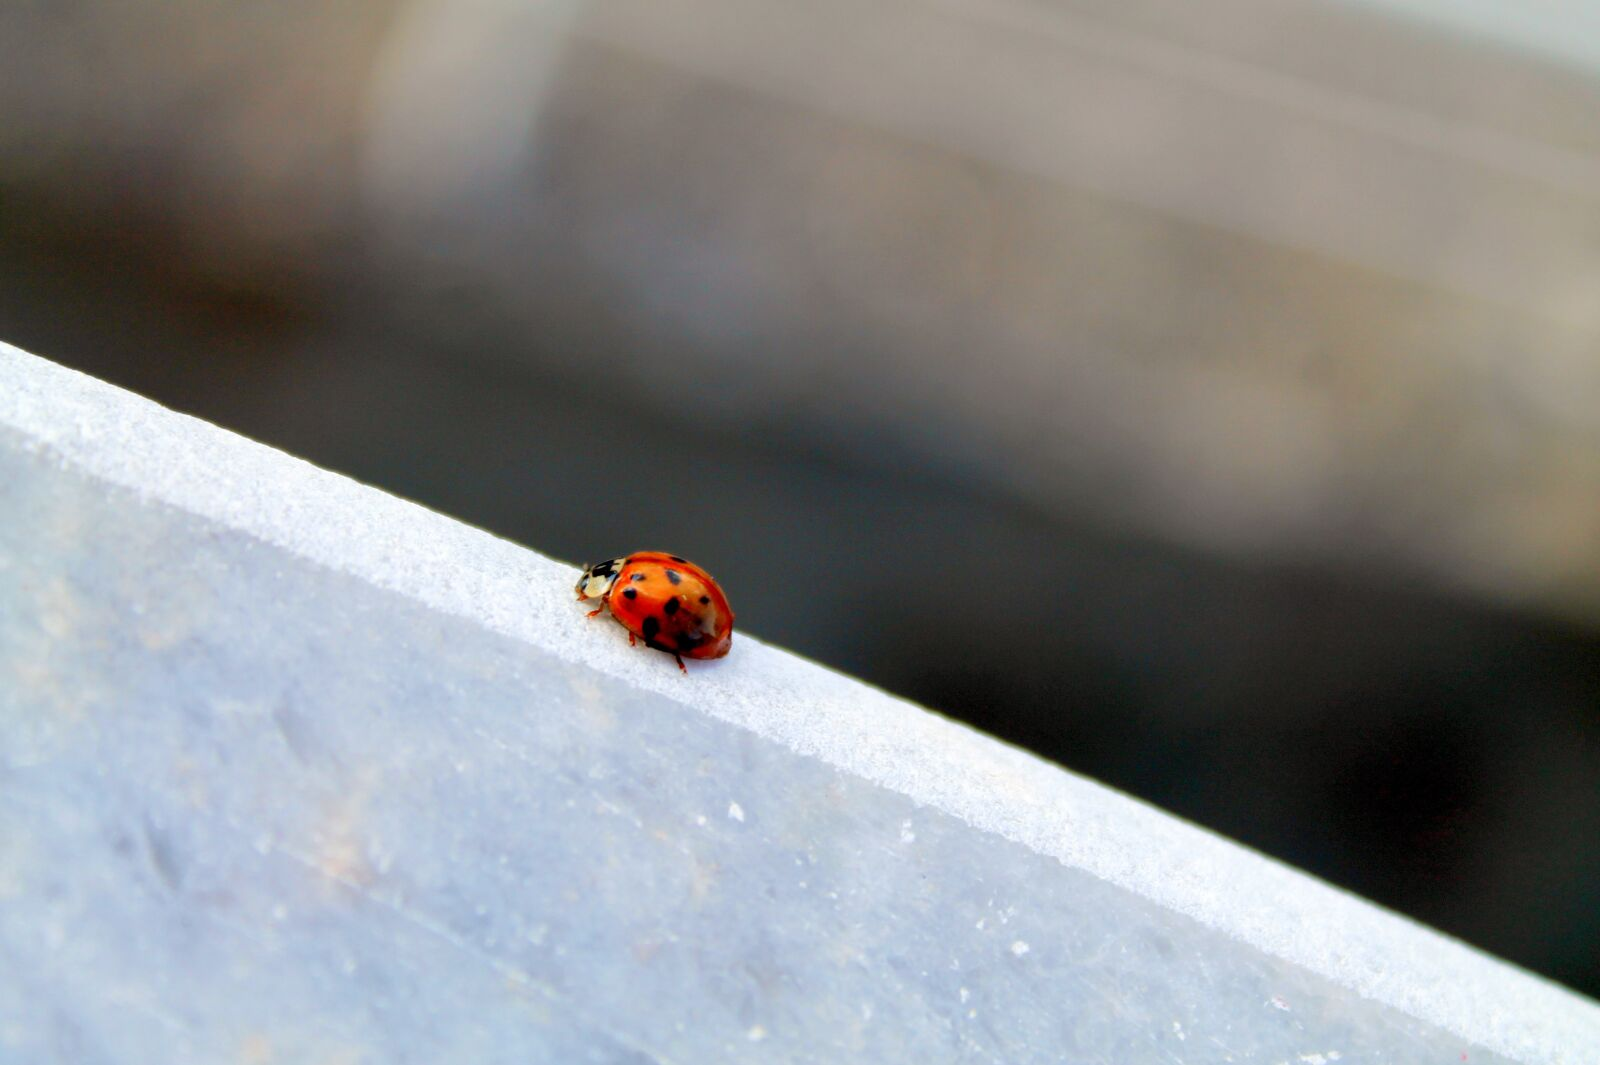 "Canon EOS 1100D (EOS Rebel T3 / EOS Kiss X50) sample photo. ""Ladybug, bug, little"" photography"